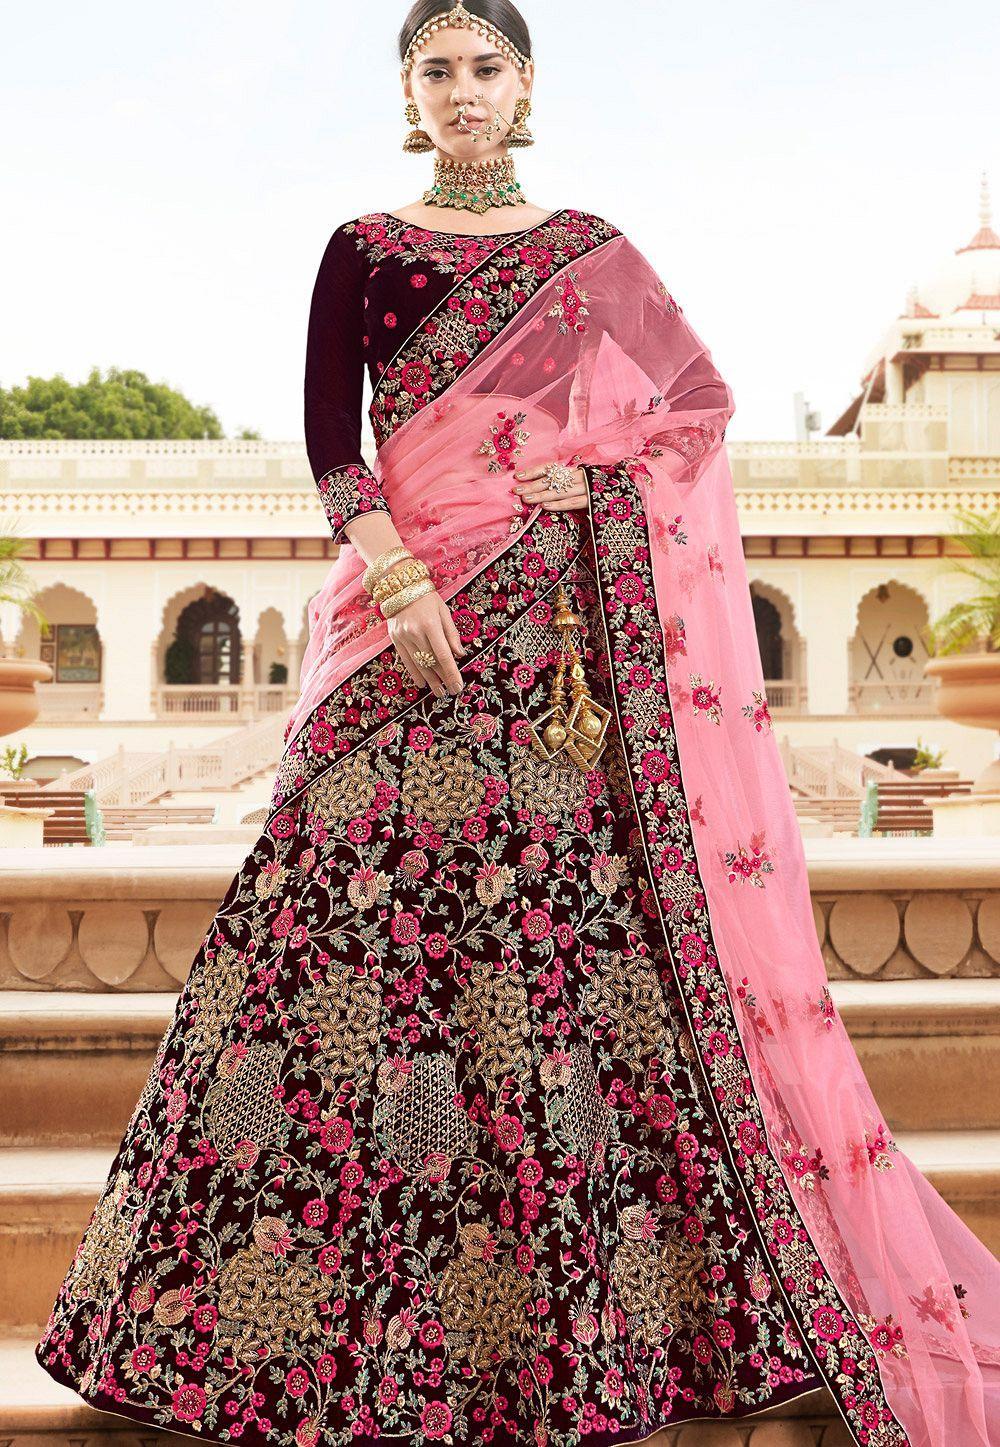 a1b3ab1ce Buy Maroon velvet Indian wedding lehenga in UK